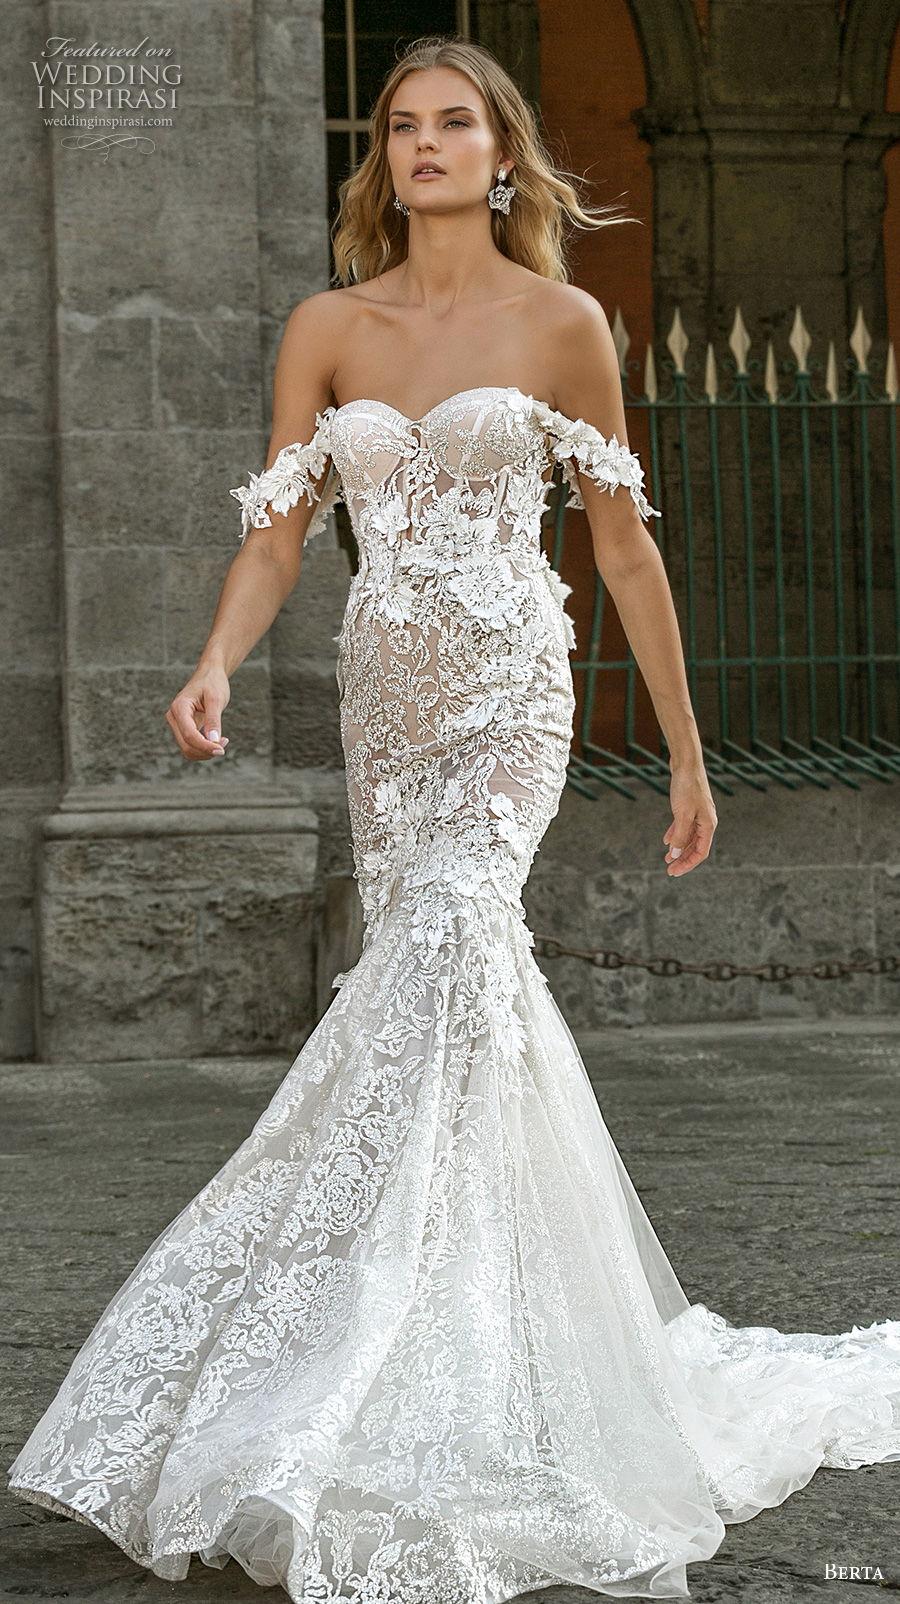 berta fall 2020 bridal off the shoulder sweetheart neckline full embeliishment bustier romantic mermaid wedding dress mid back medium train (1) mv